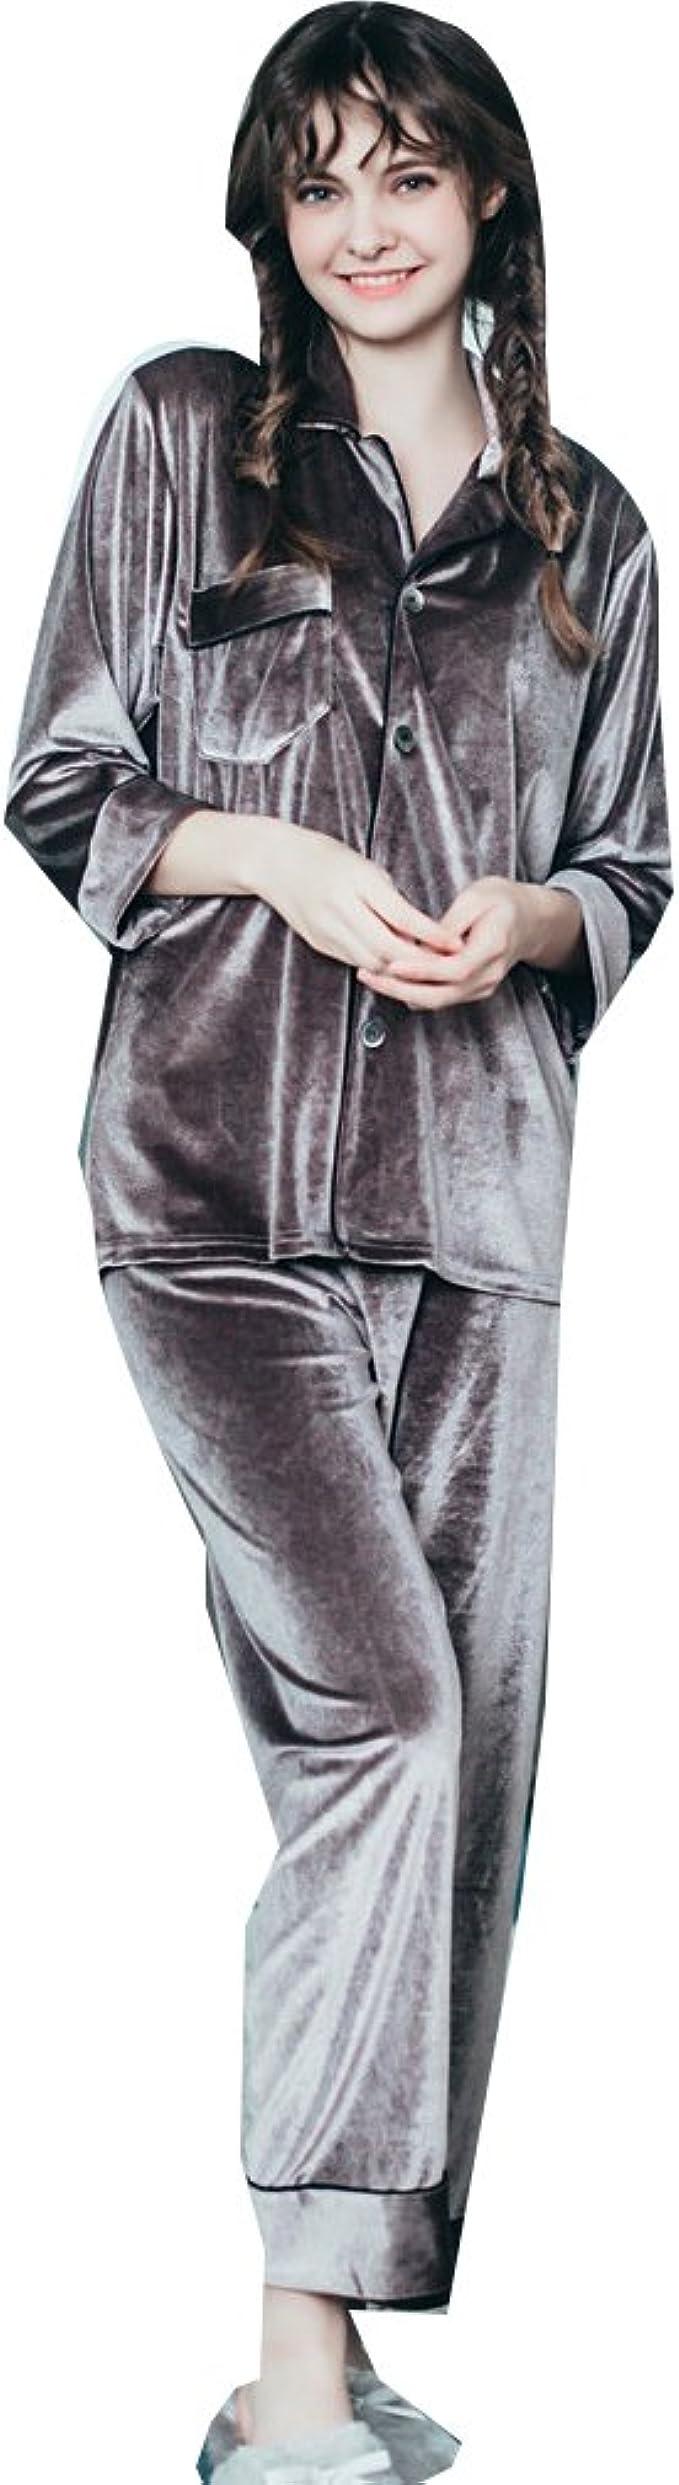 WTUS - Ropa De Dormir Pijamas De e moda casual Para Mujer ...